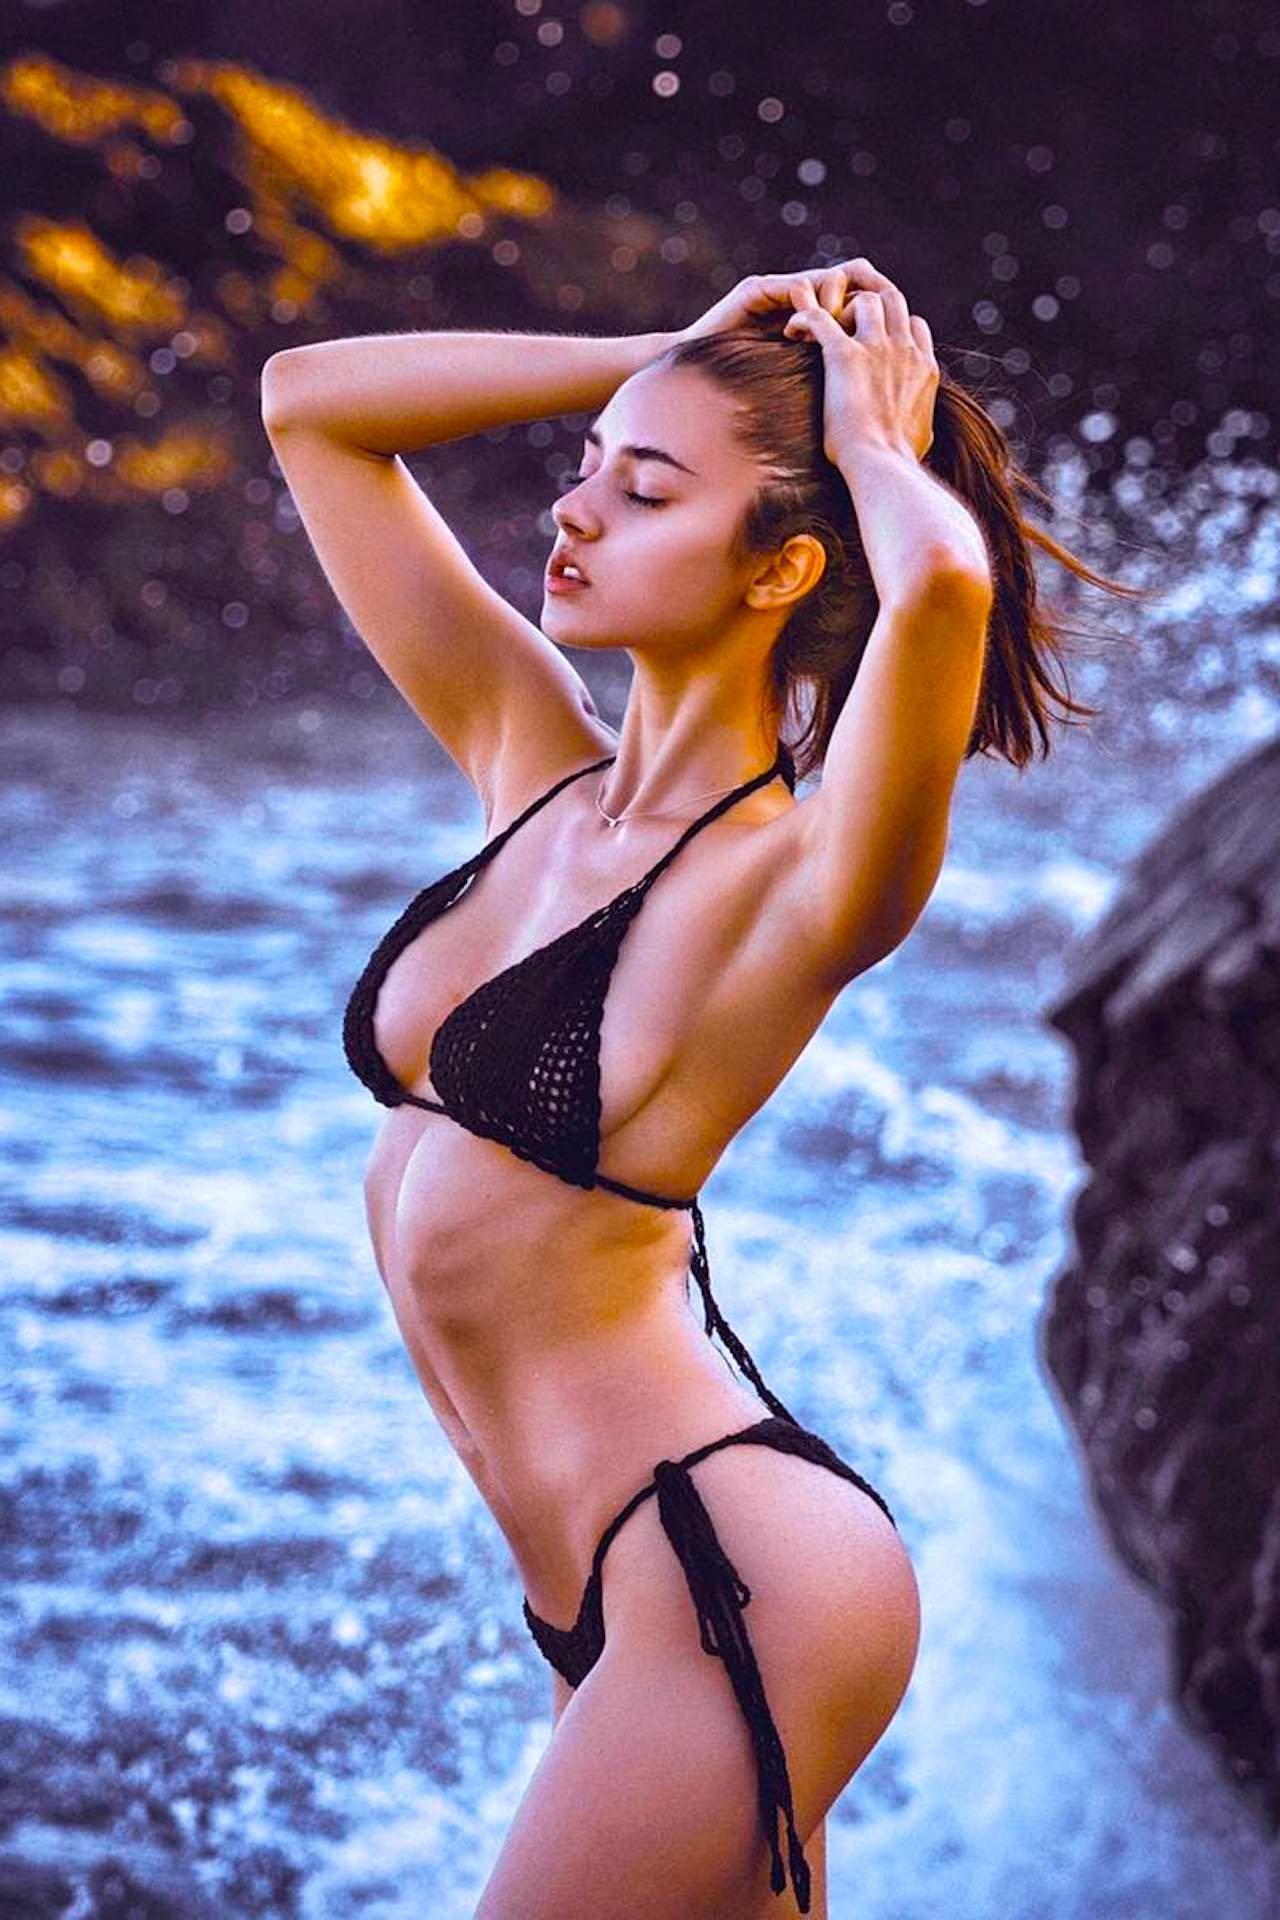 Instagram 2019 Sarah Curr naked photo 2017